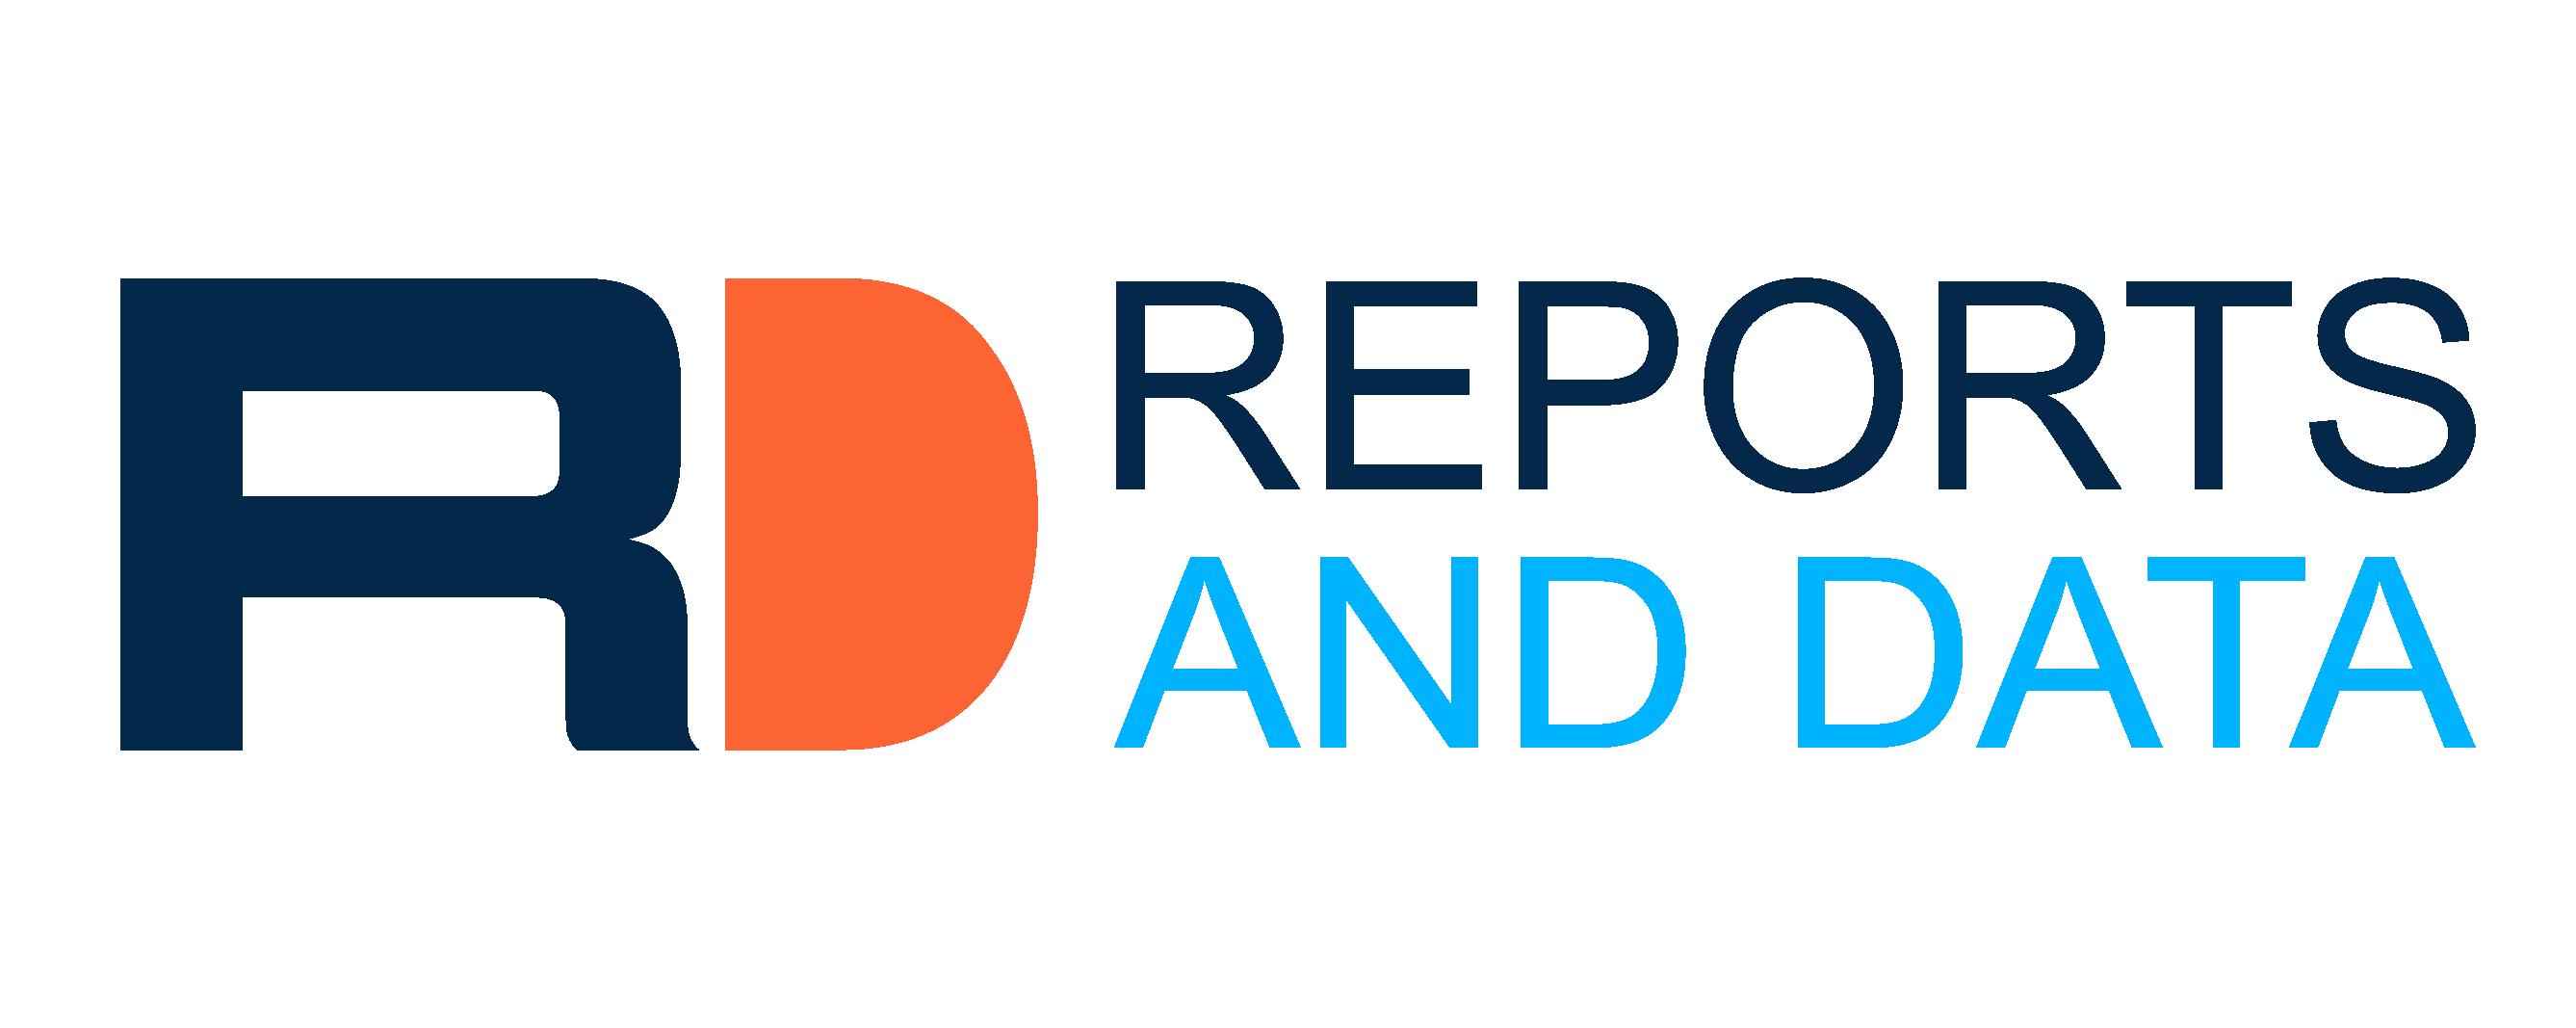 Health Information Systems Market Analysis 2019 | Top Players - GE Healthcare, Carestream Health, Siemens Healthineers, McKesson Corporation, Philips Healthcare